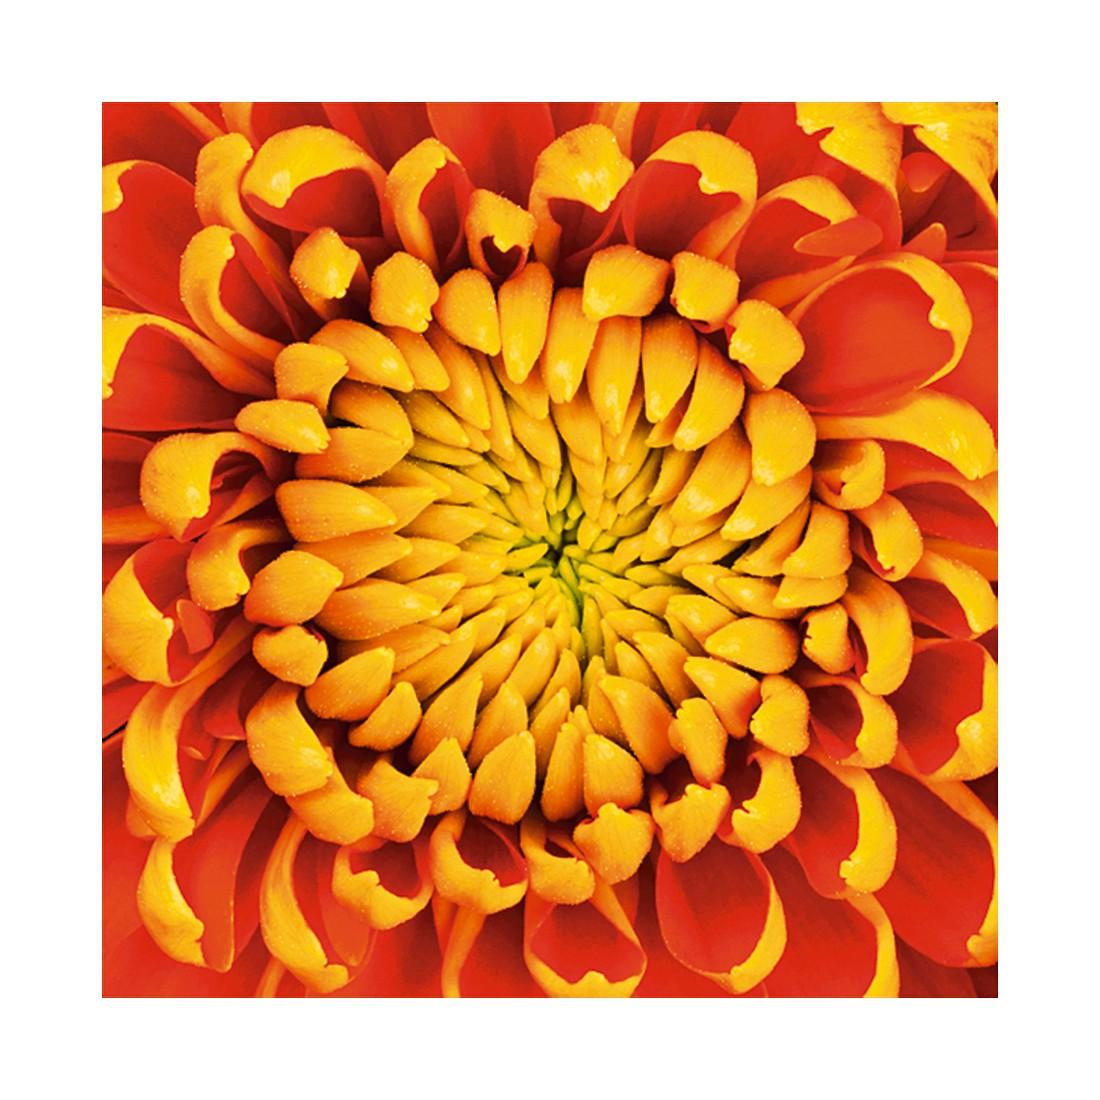 glasbild yellow dahlia flower isolated gr e 50 x 50 cm artland bestellen. Black Bedroom Furniture Sets. Home Design Ideas